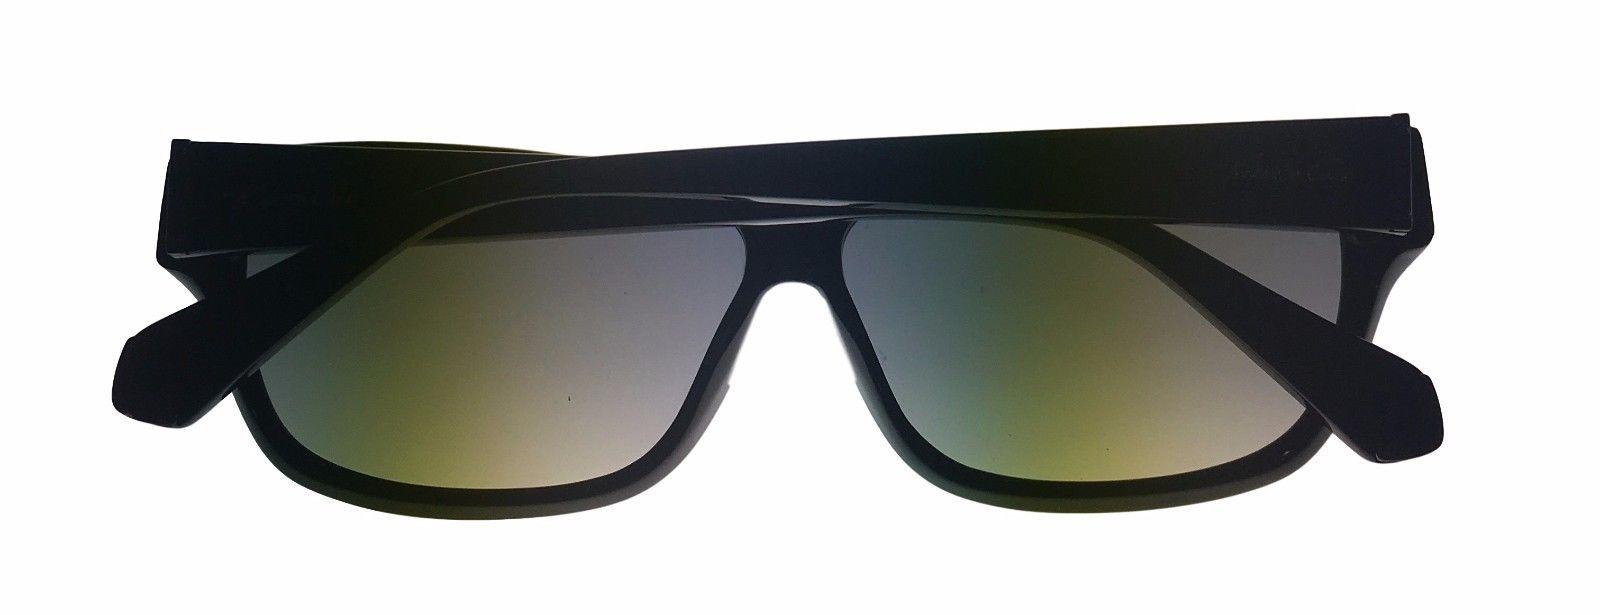 Kenneth Cole New York Mens Sunglass Soft Square Black, Smoke Lens KC7034 1B image 4